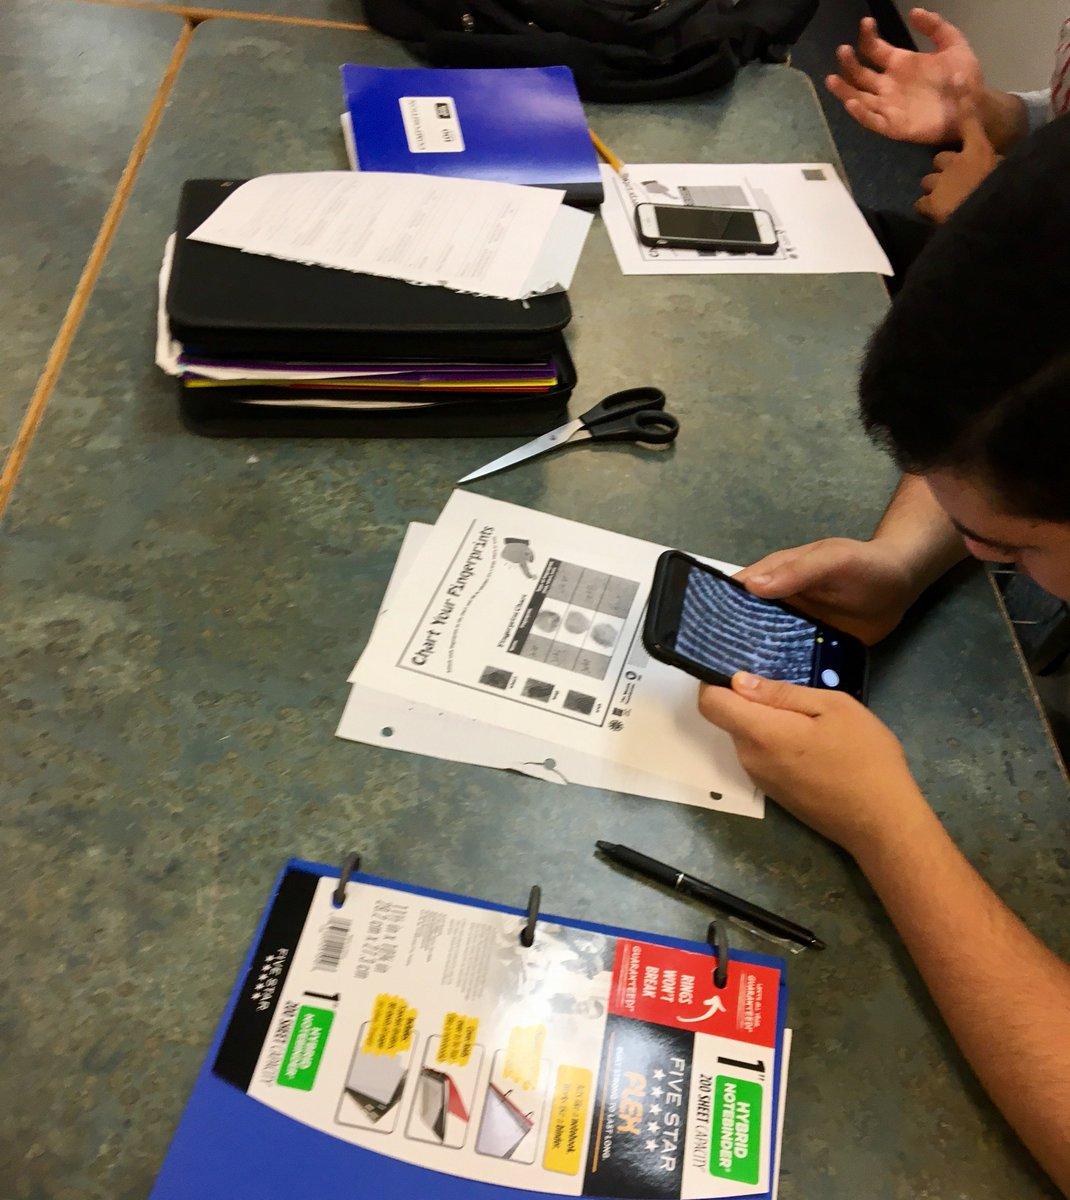 Fingerprinting spektroskopie